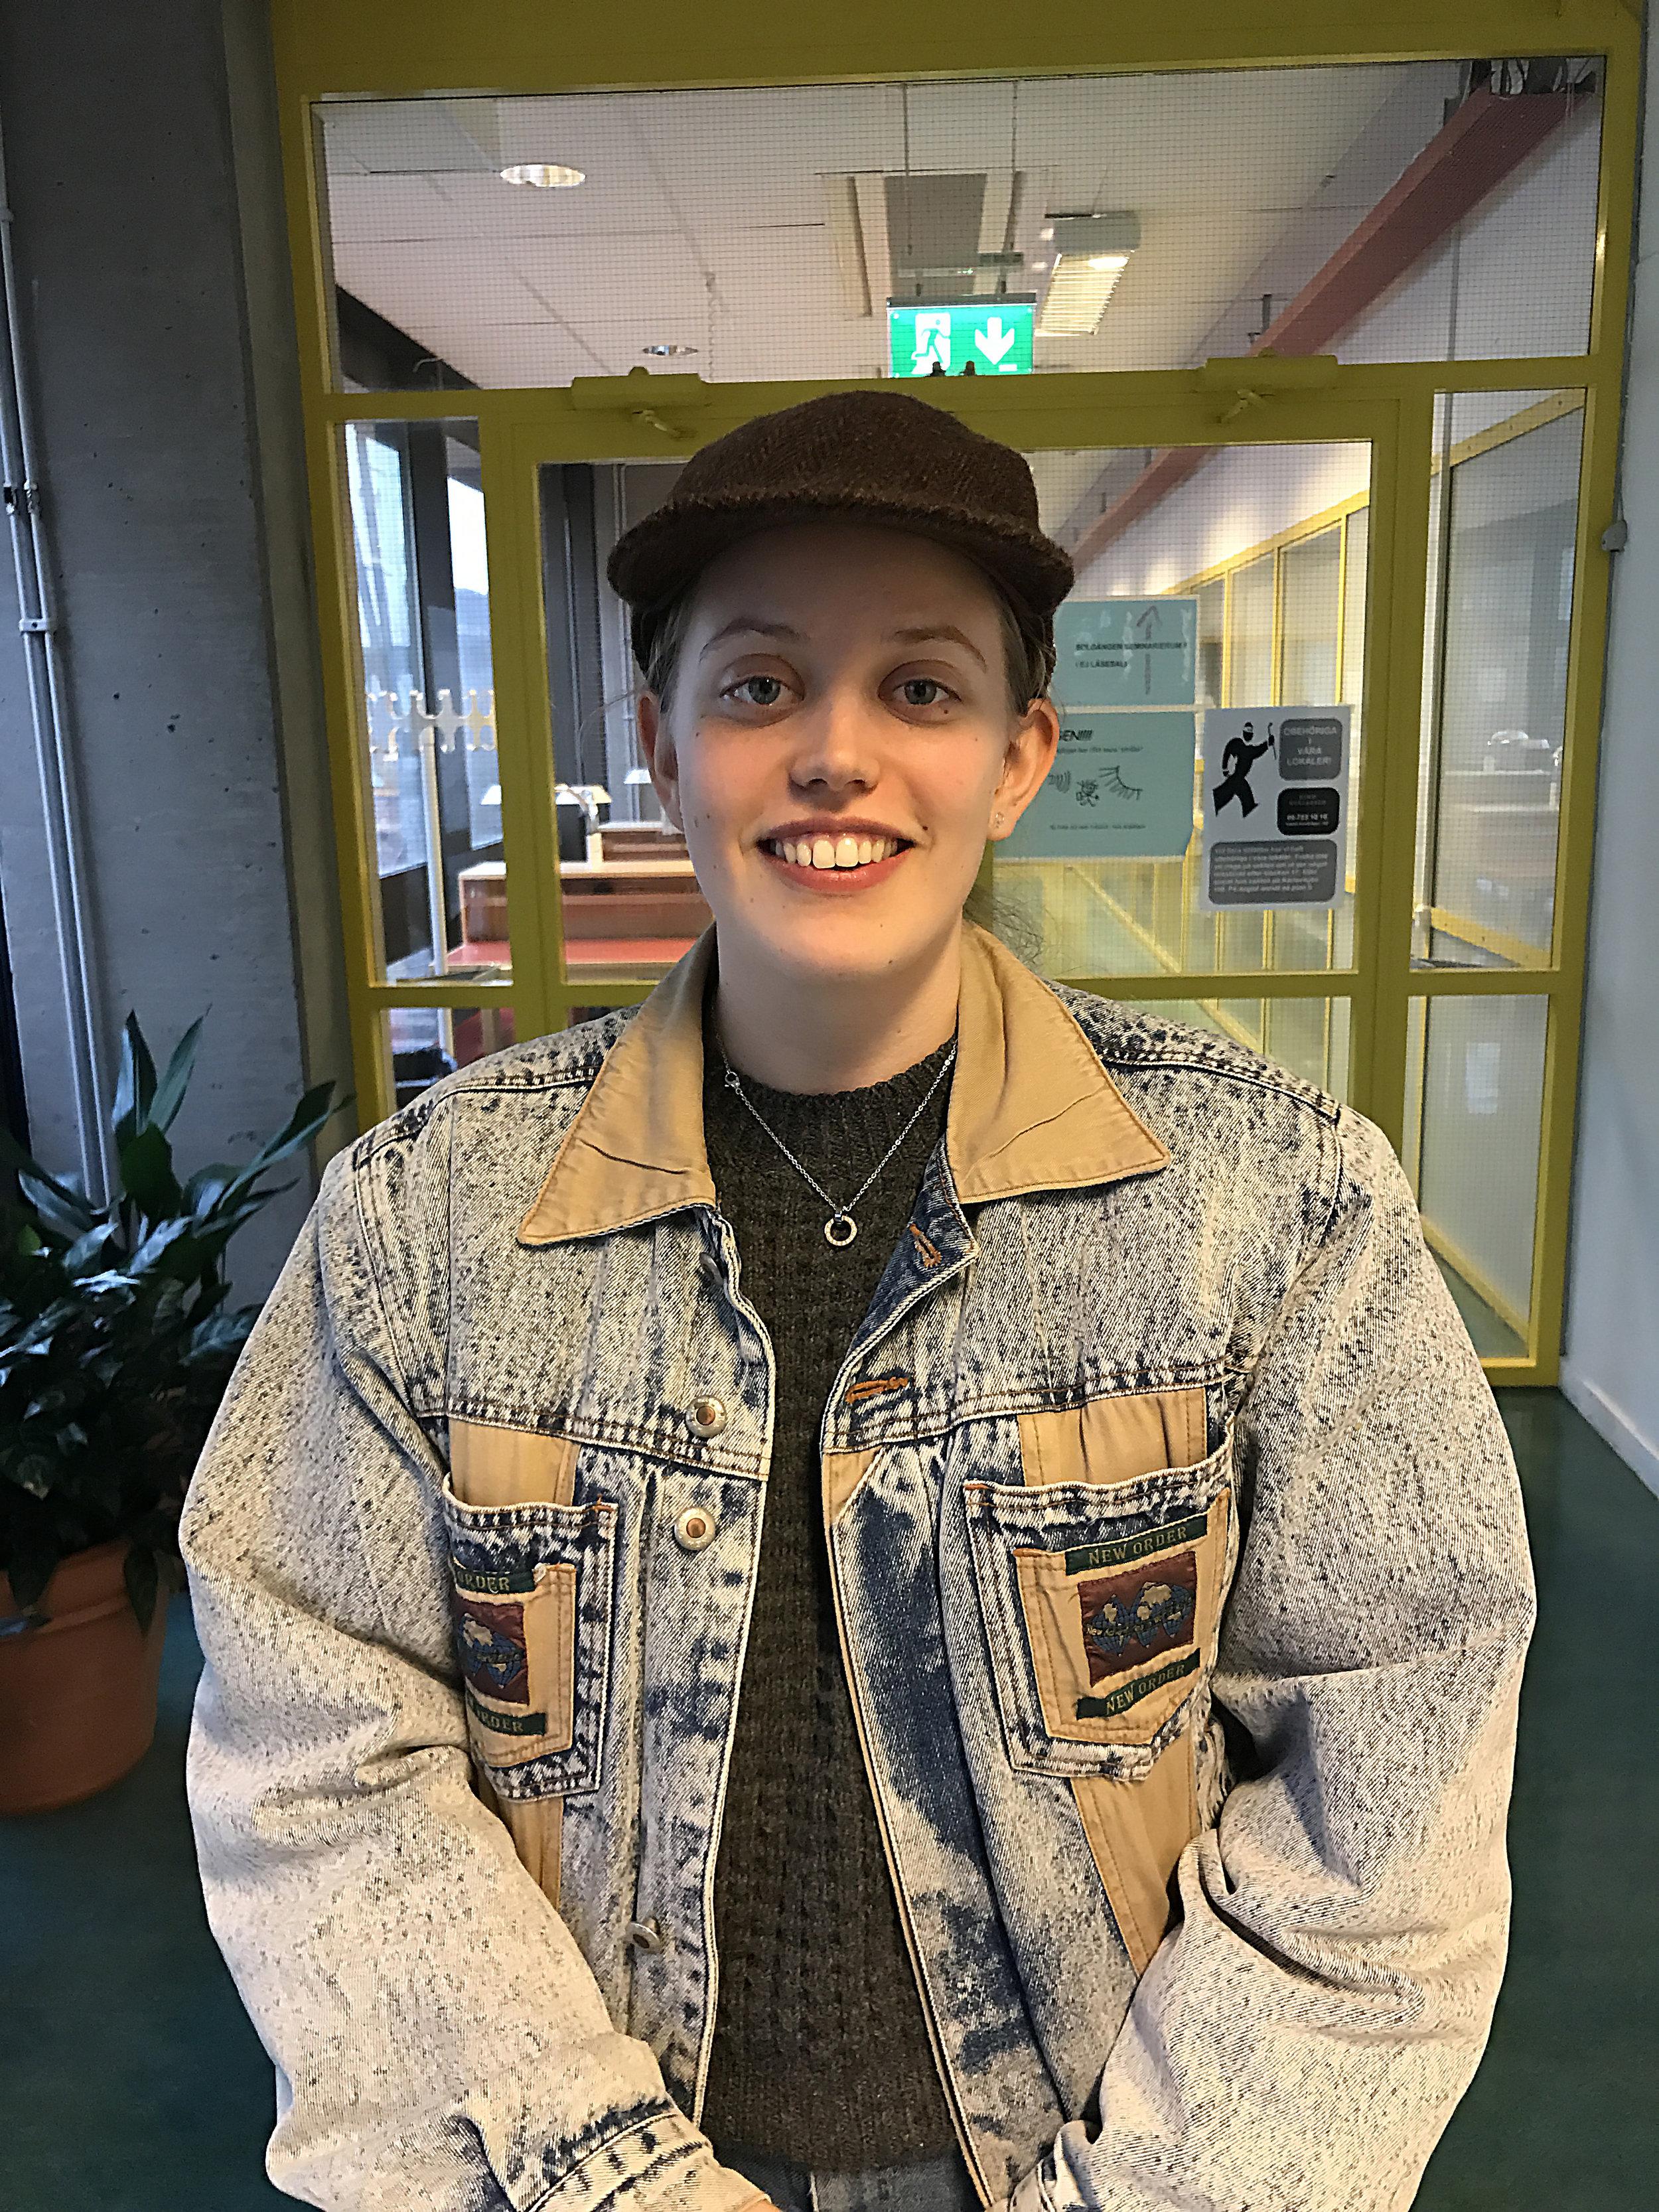 Elin Nordlund, 20. Journalistikstudent.